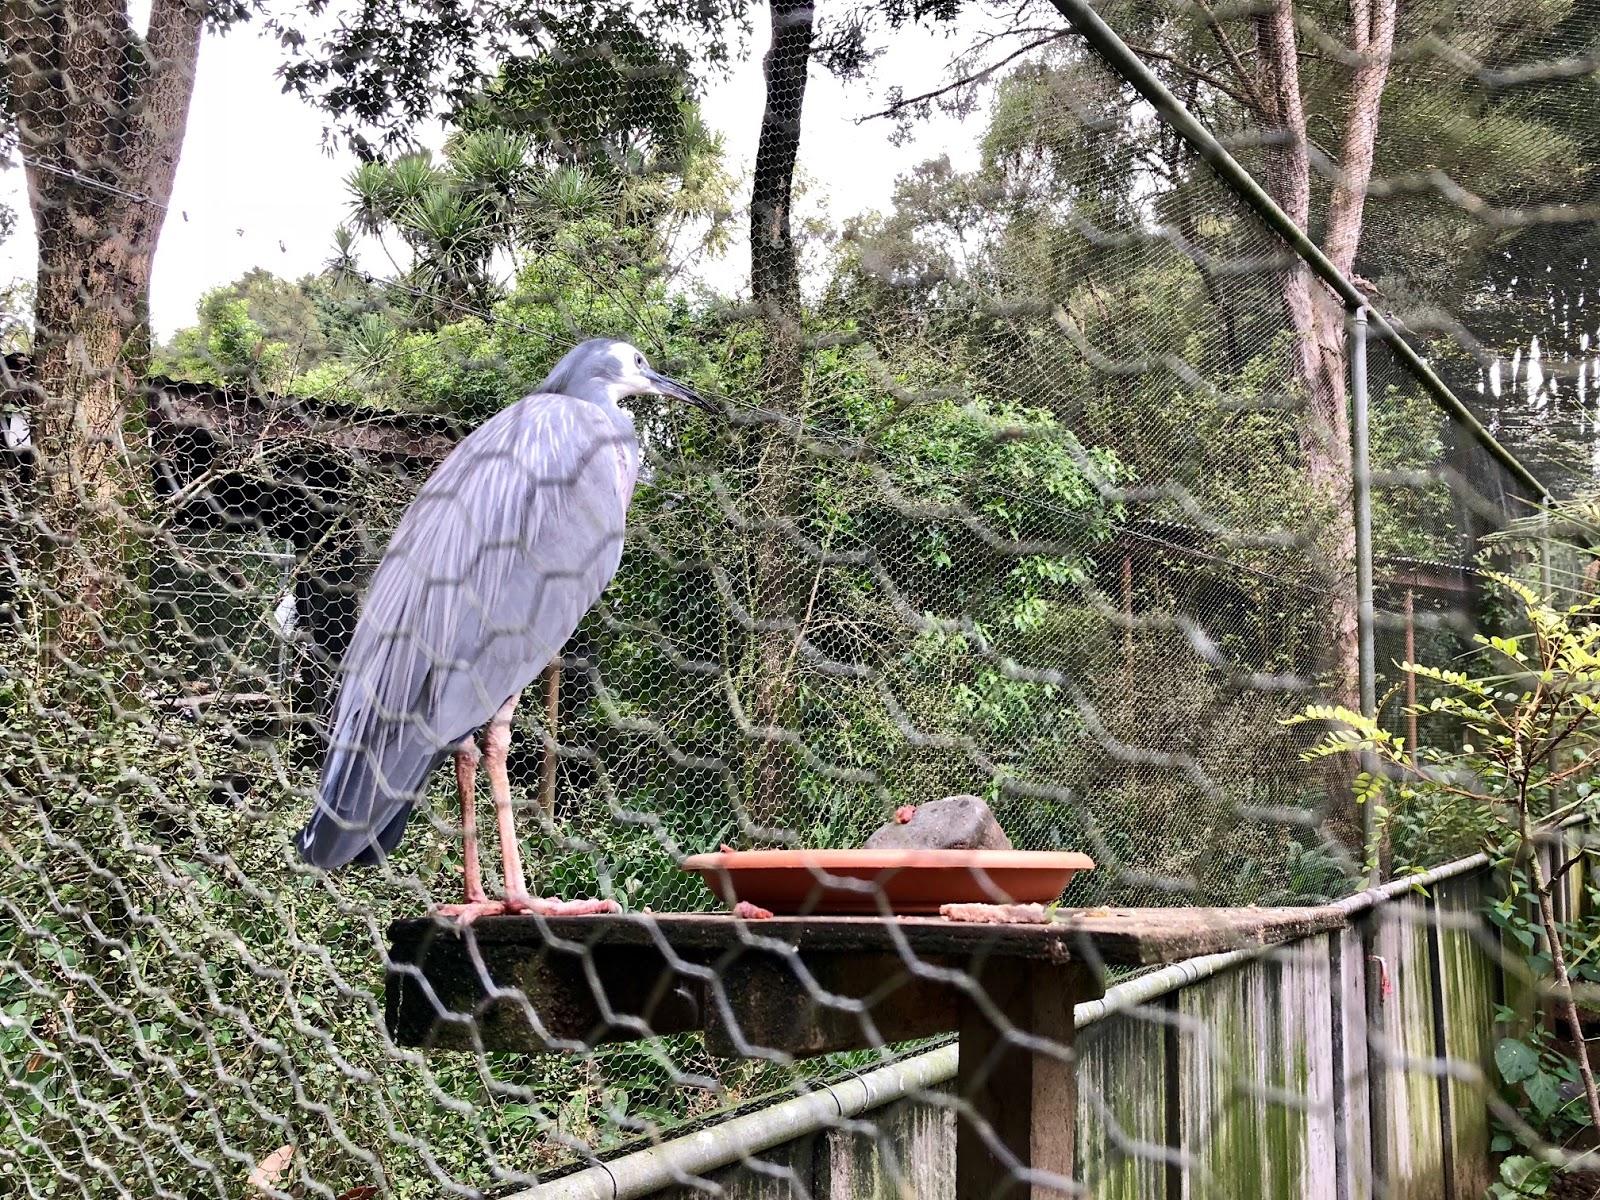 Kiwi House Otorohanga Best Place To See Kiwis